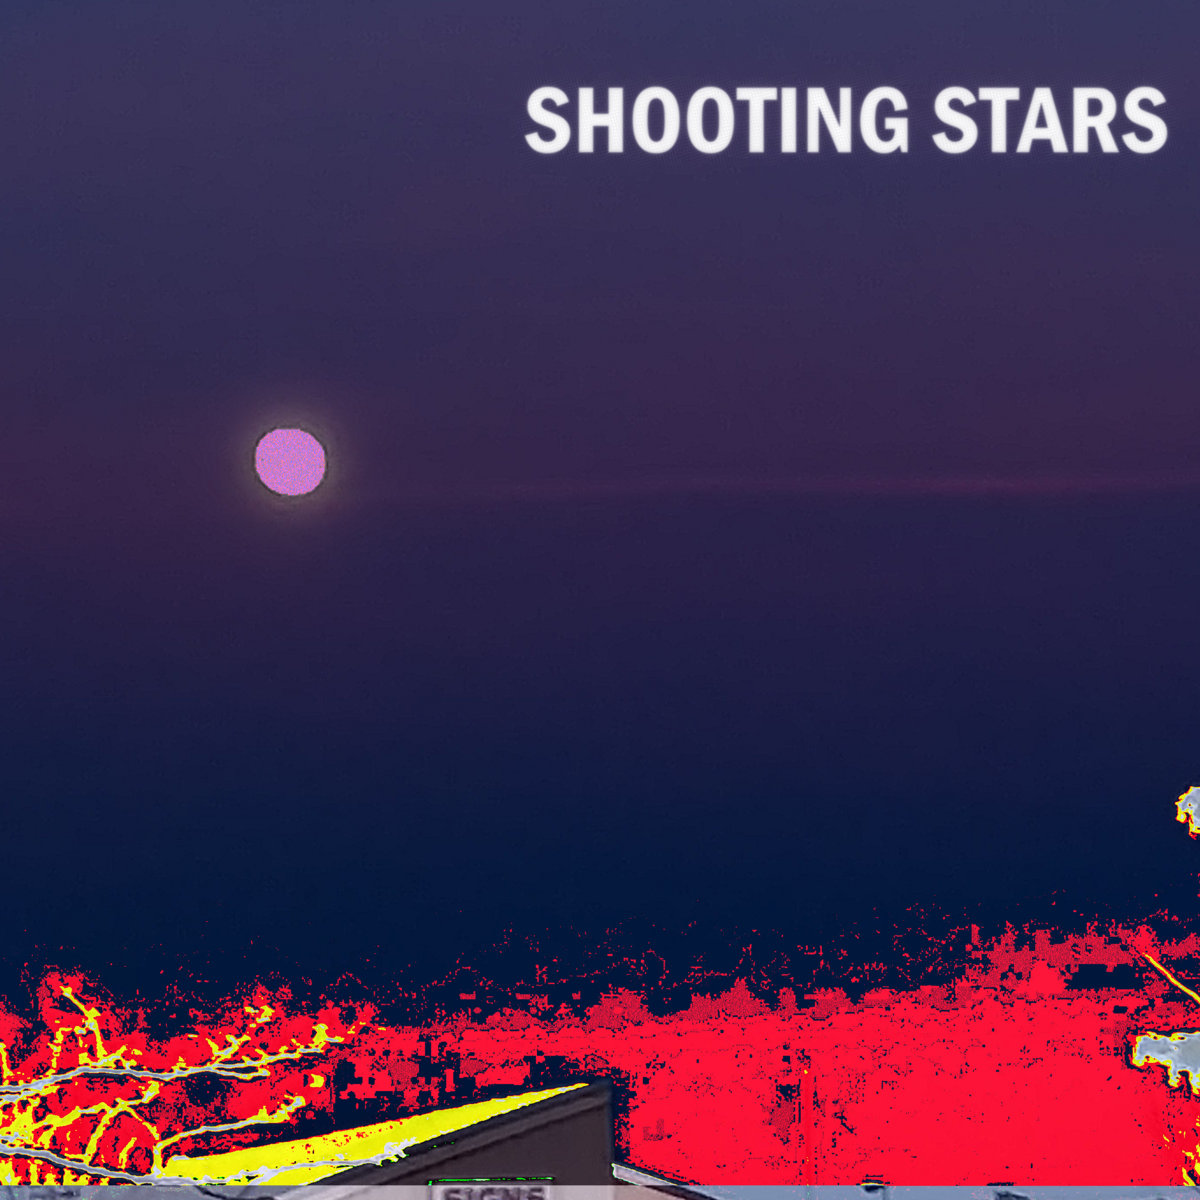 Shooting Stars Bag Raiders Cover